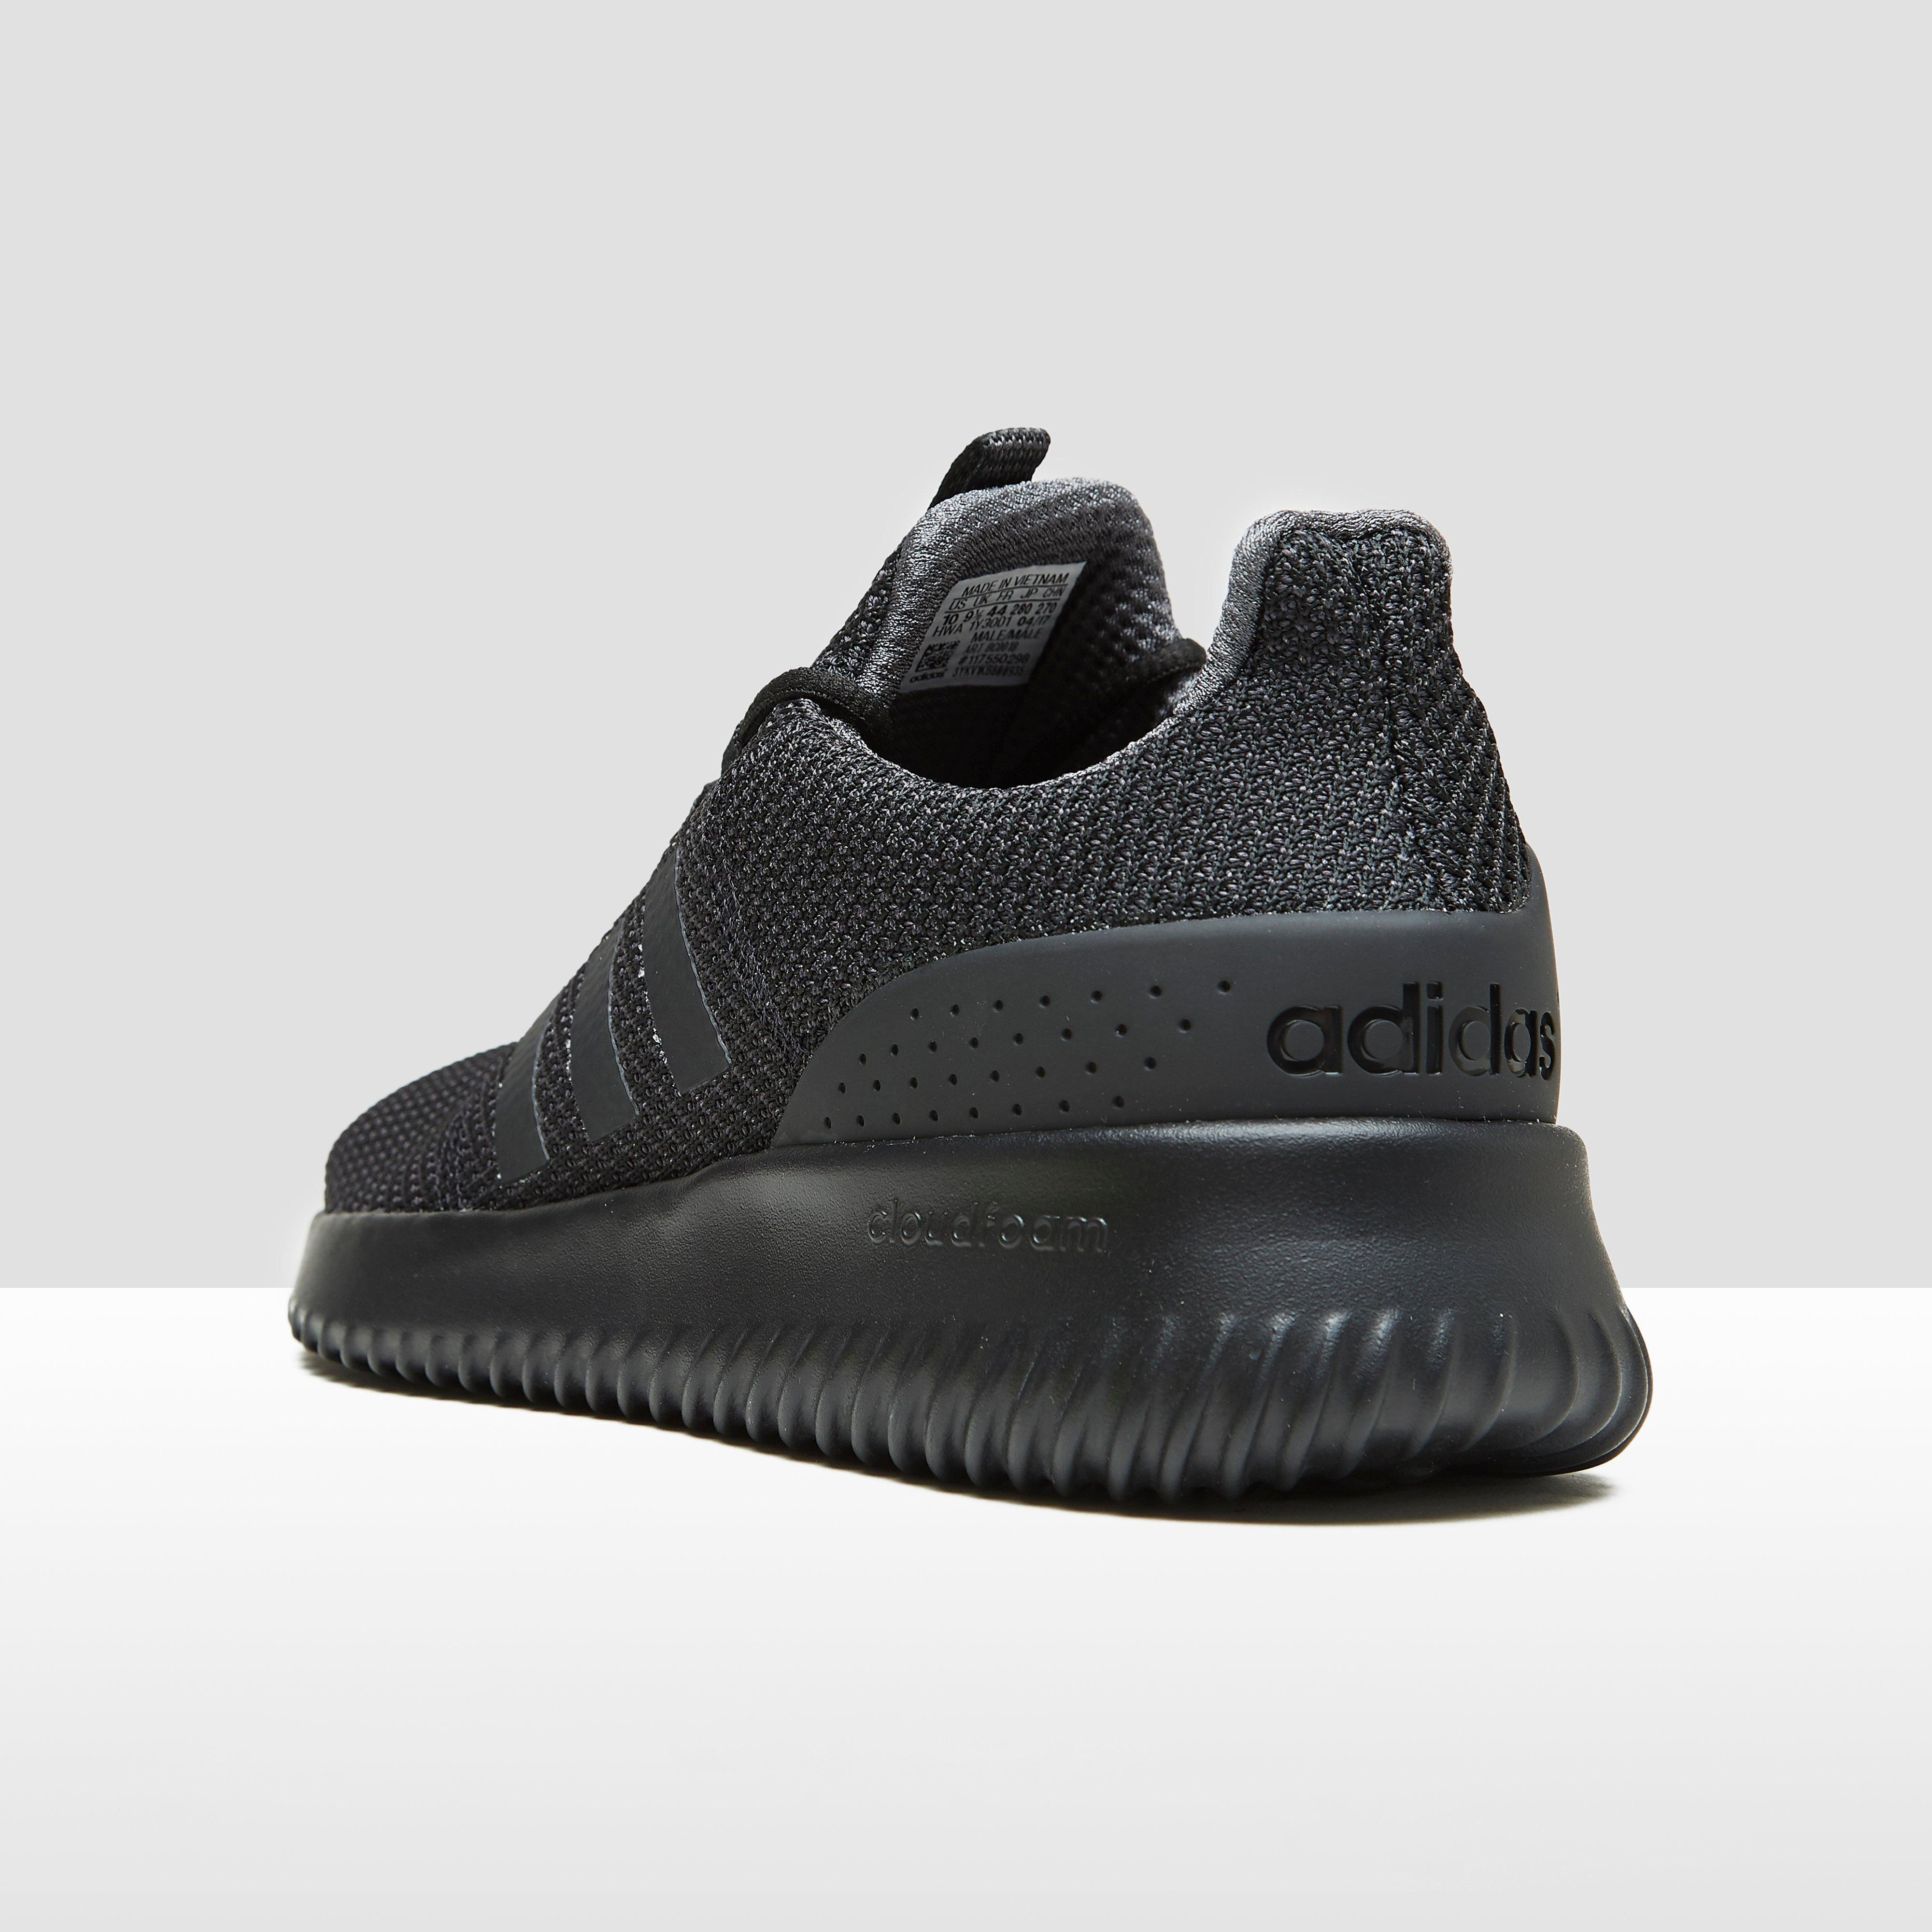 Mousse Nuage Hommes Adidas Fitnessschuhe Ultime - Noir - 41 1/3 Ue lJsIwrr